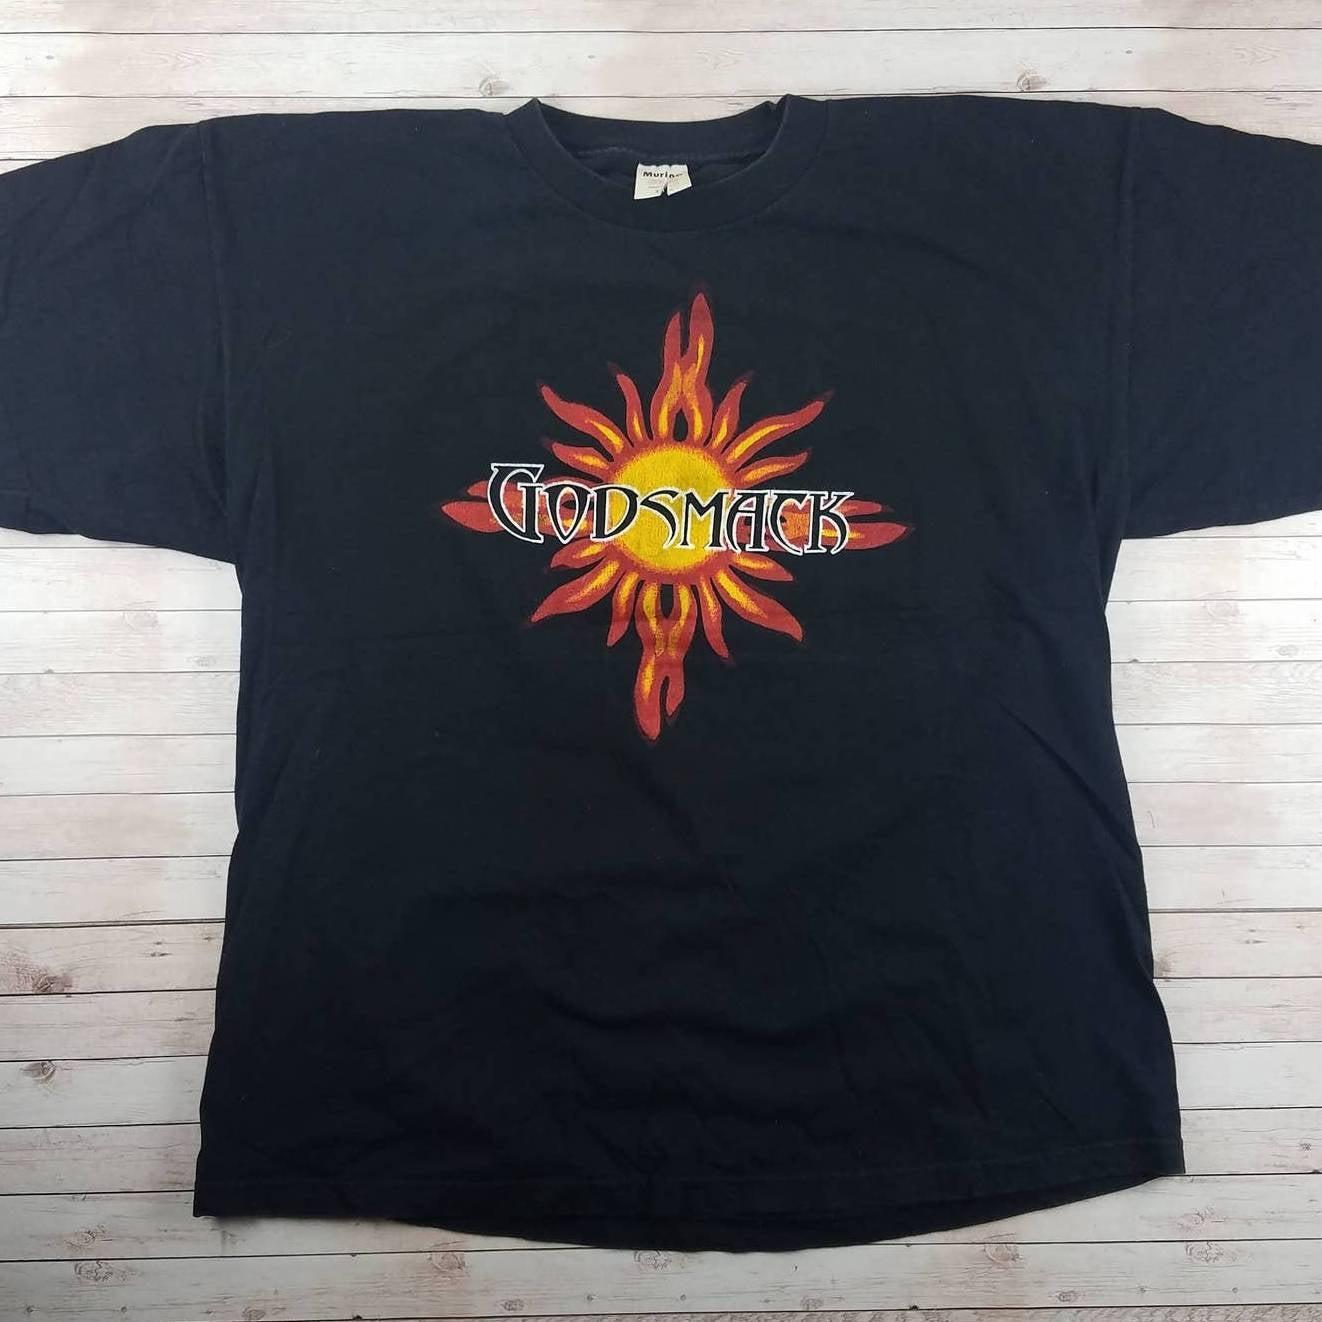 VTG 90s Godsmack Murina Band Tee Shirt